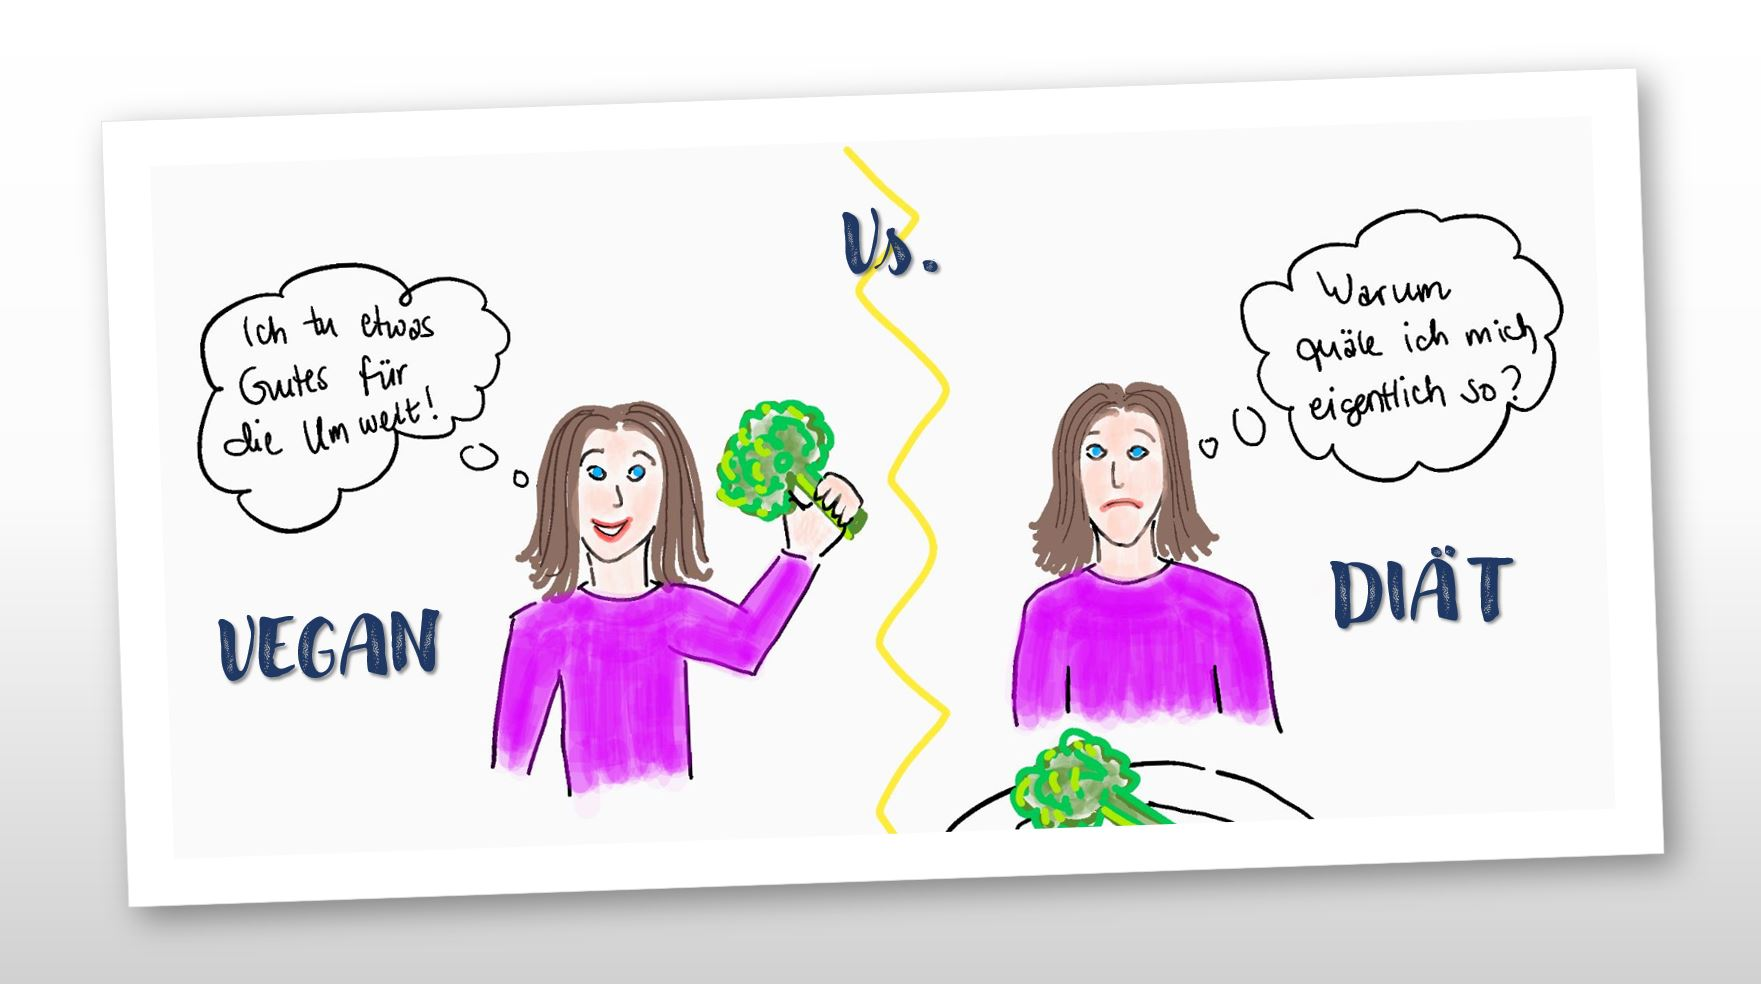 Abnehmen Tipps: Vegan vs. Diät